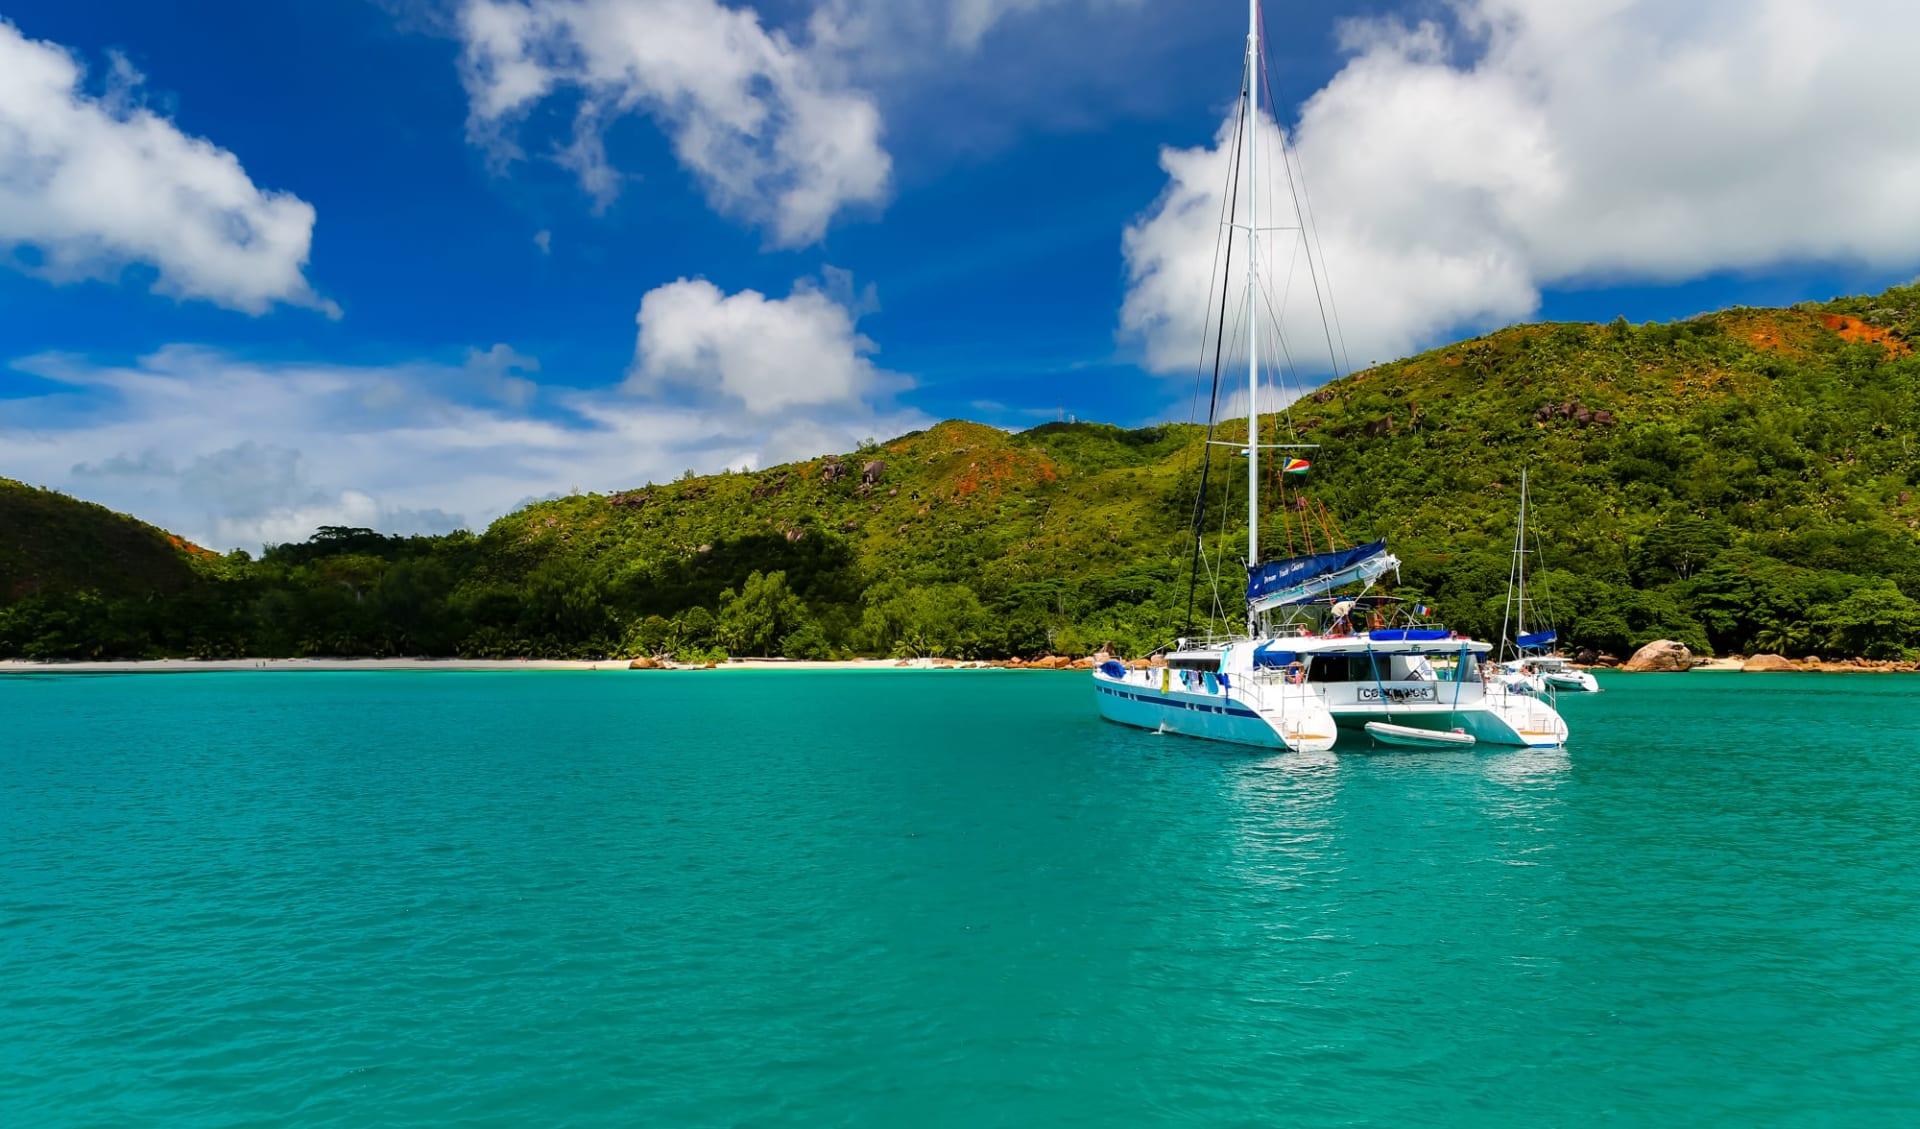 Sisters Dream ab Praslin: Eleuthera 60 - Seychelles (113)